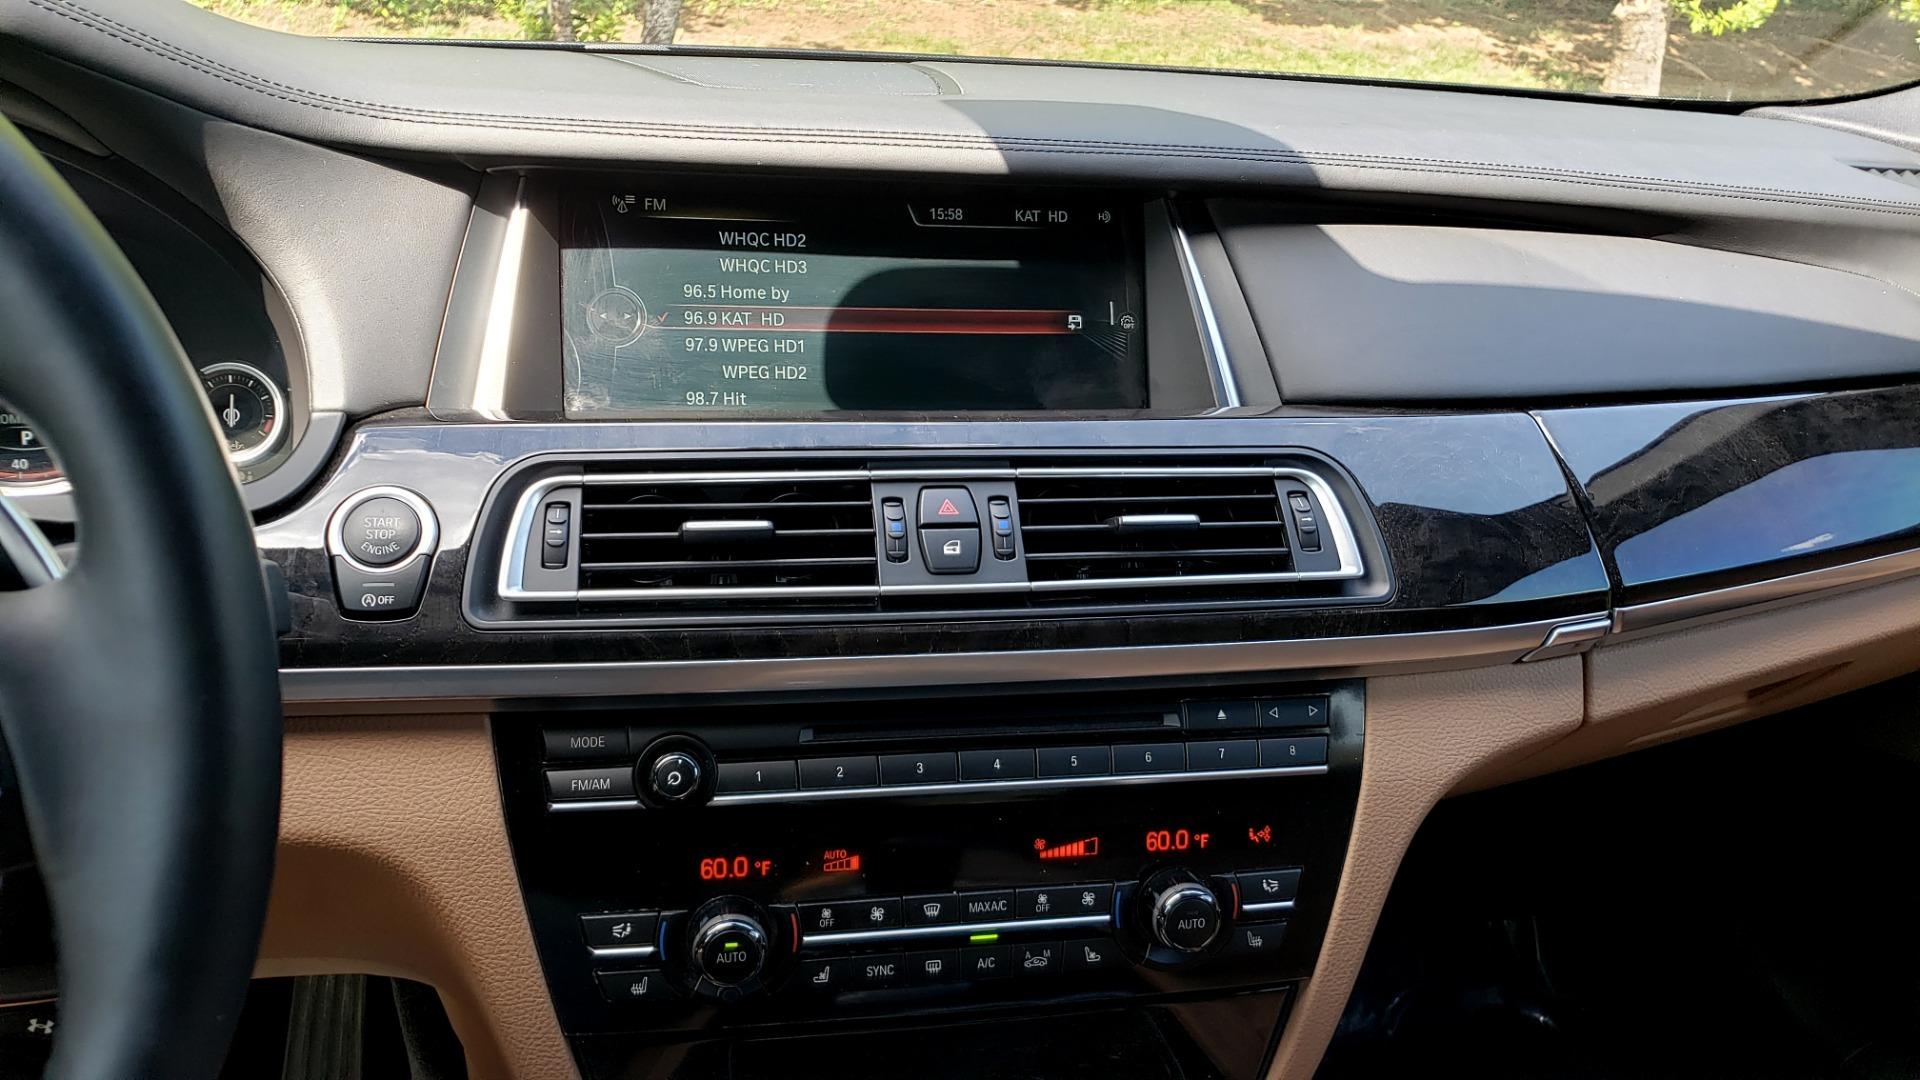 Used 2014 BMW 7 SERIES 750LI M-SPORT / EXEC PKG / DRVR ASST / LIGHTING / NAV / SUNROOF for sale Sold at Formula Imports in Charlotte NC 28227 41